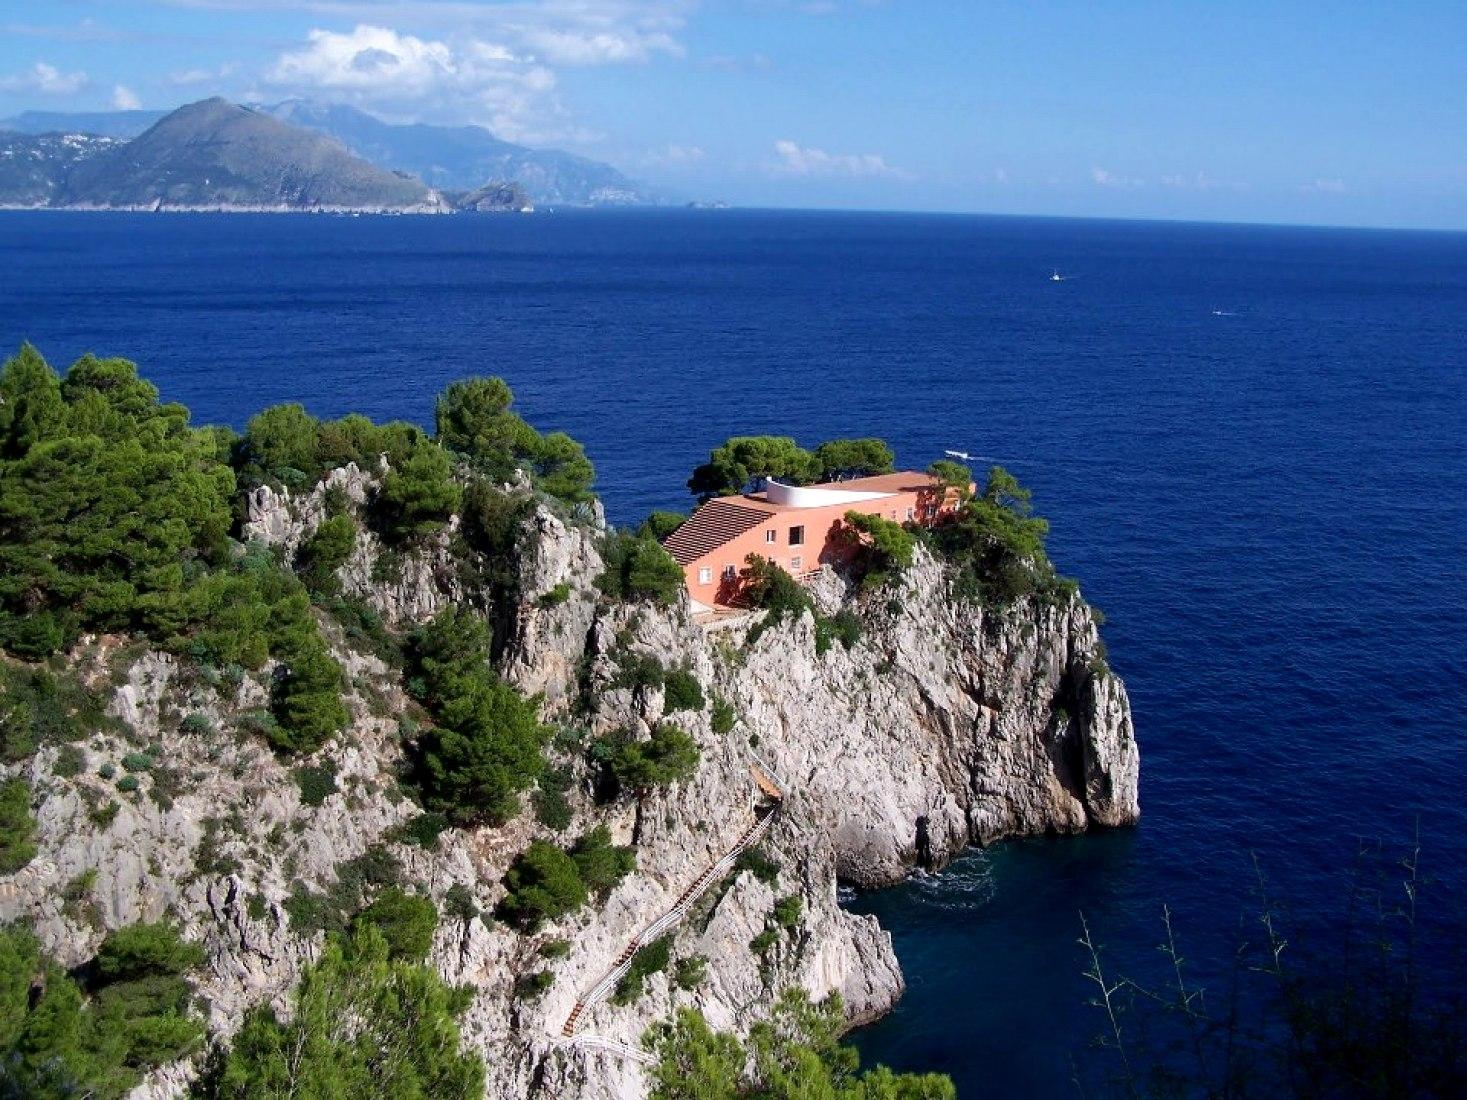 Casa Curzio Malaparte en Punta Massullo, Capri. Arquitecto.-  Adalberto Libera 1937. Isabel Escudero Herrera.